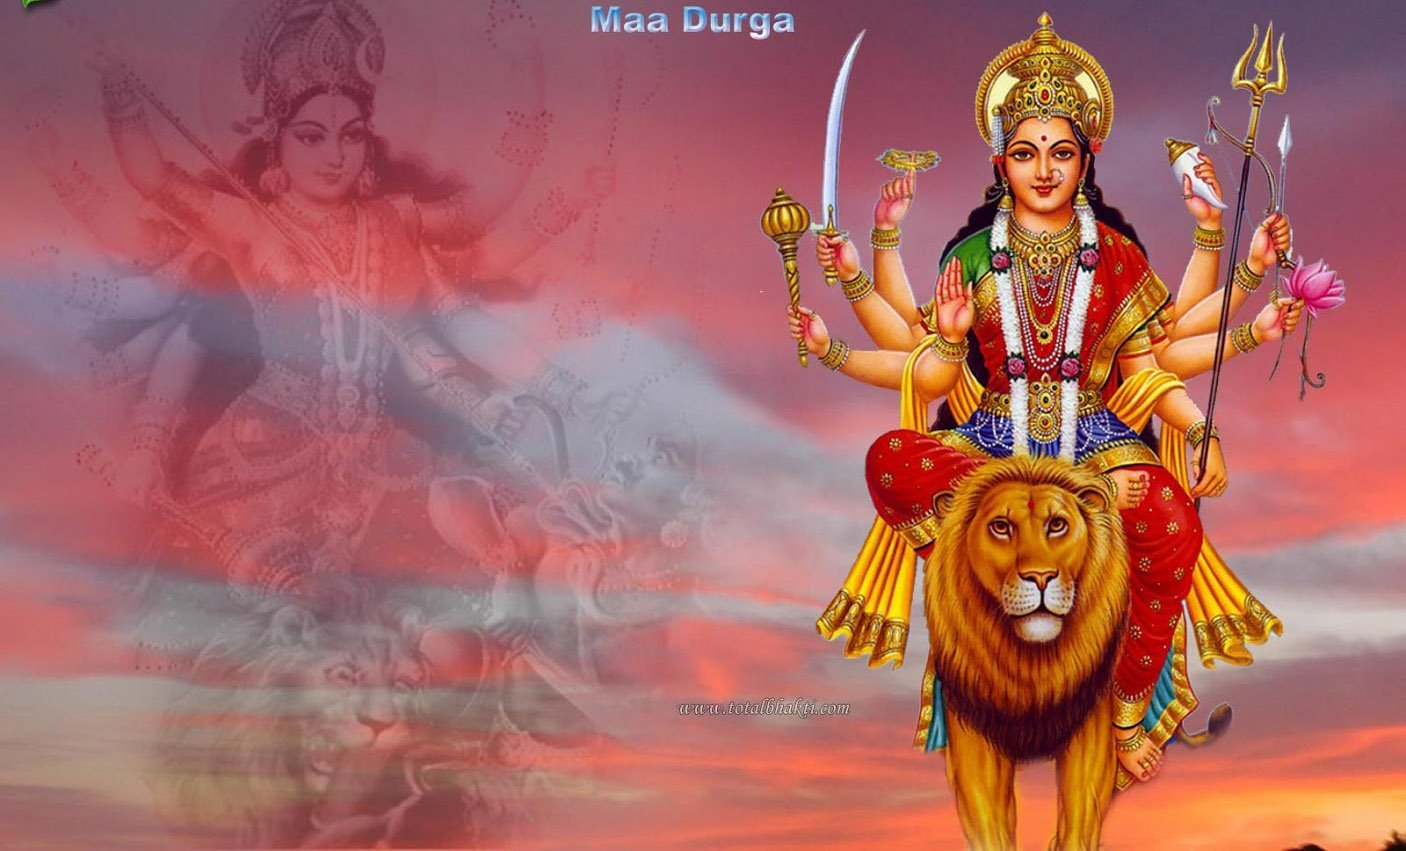 Goddess Durga on Yellow Lion, Her Vital Mount